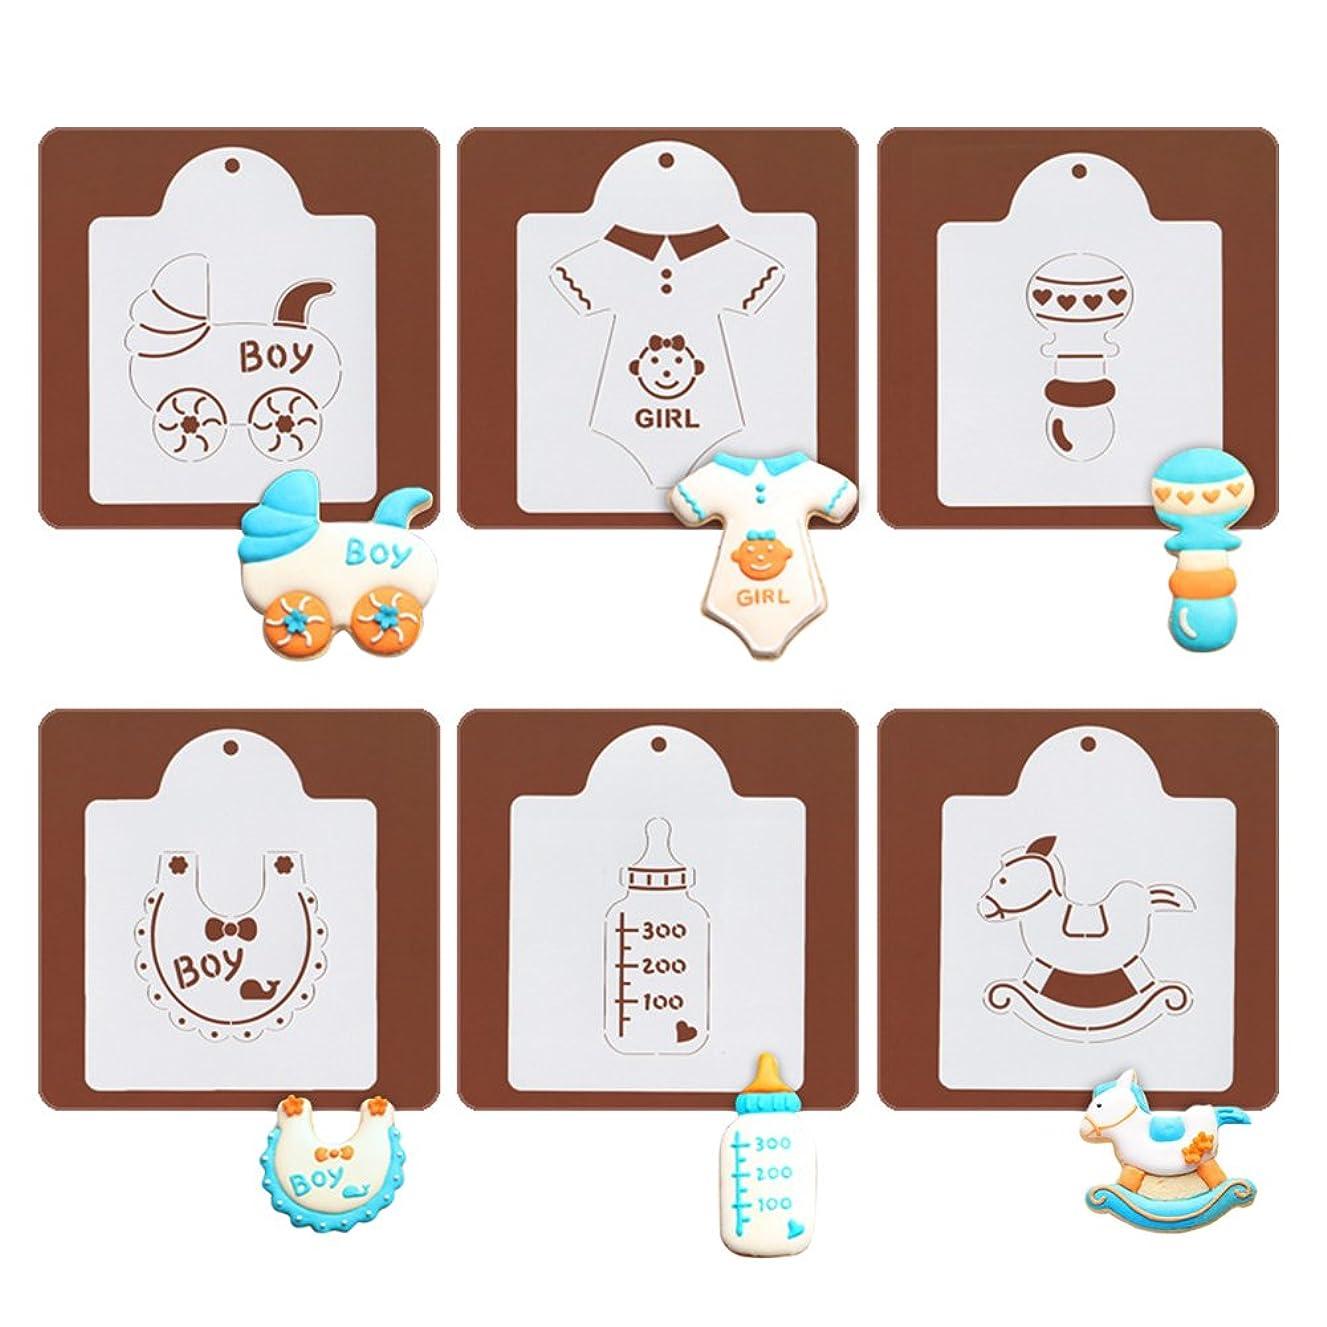 Baby Shower Cookie Stencil Set- Set of 6 - Onesie, Bib, Rattle, Bottle, Hobbyhorse and Baby Carriage - White /semi-transparent